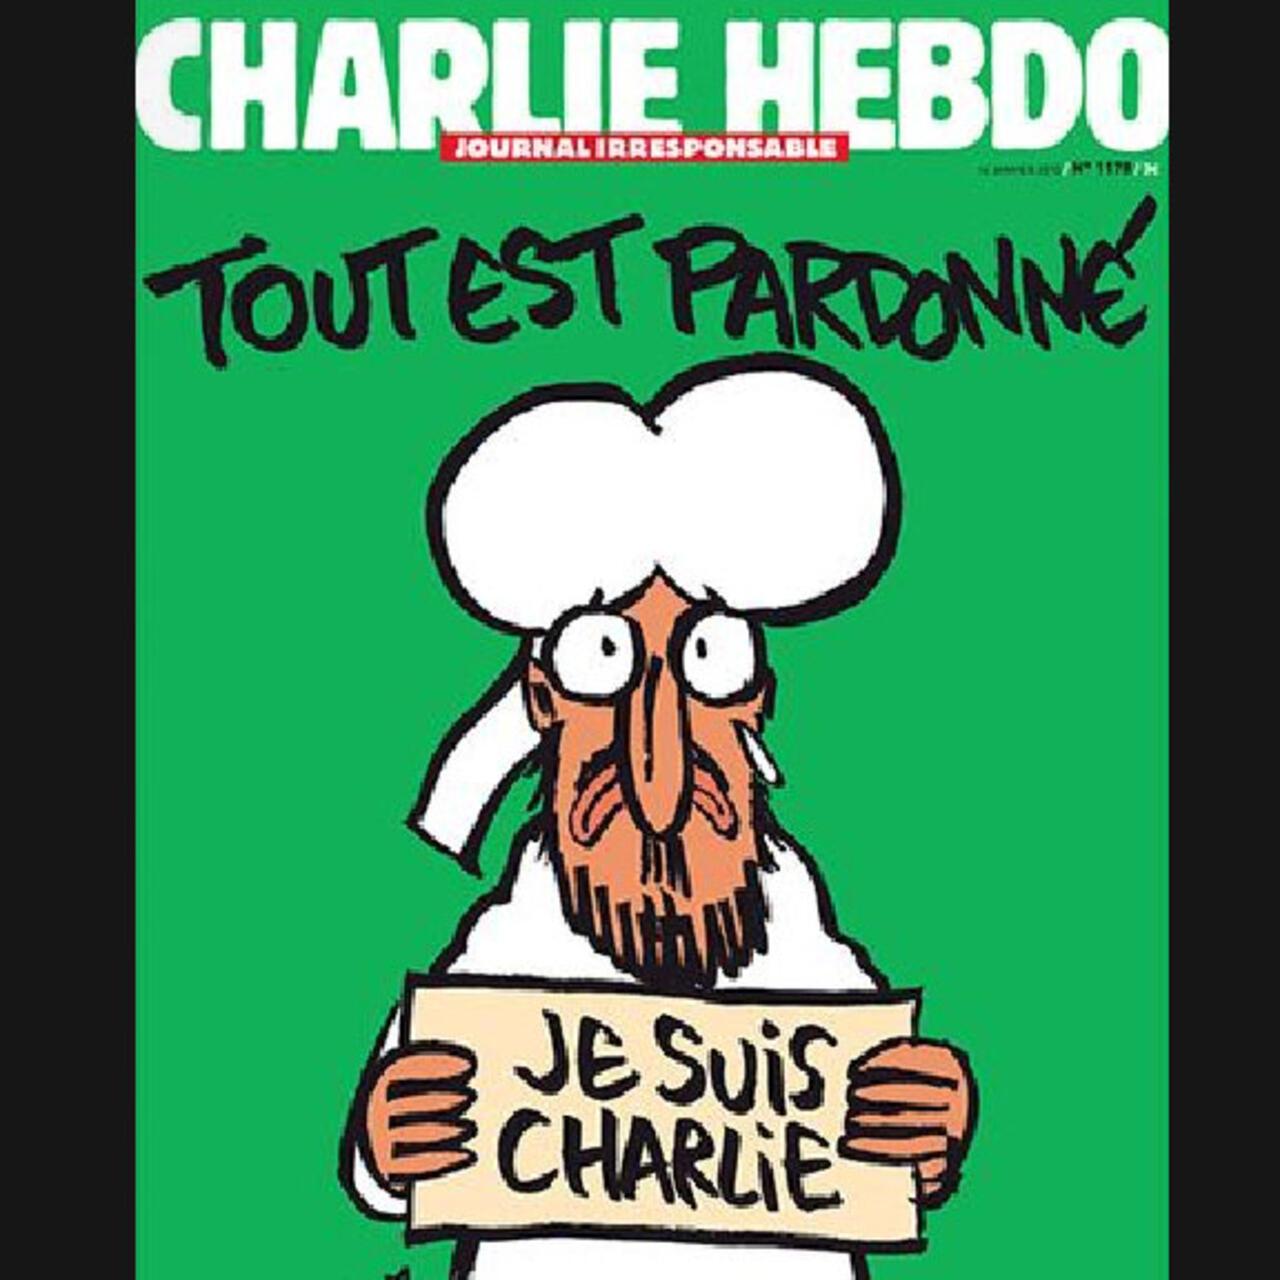 Post-attack charlie hebdo cover uses prophet cartoon